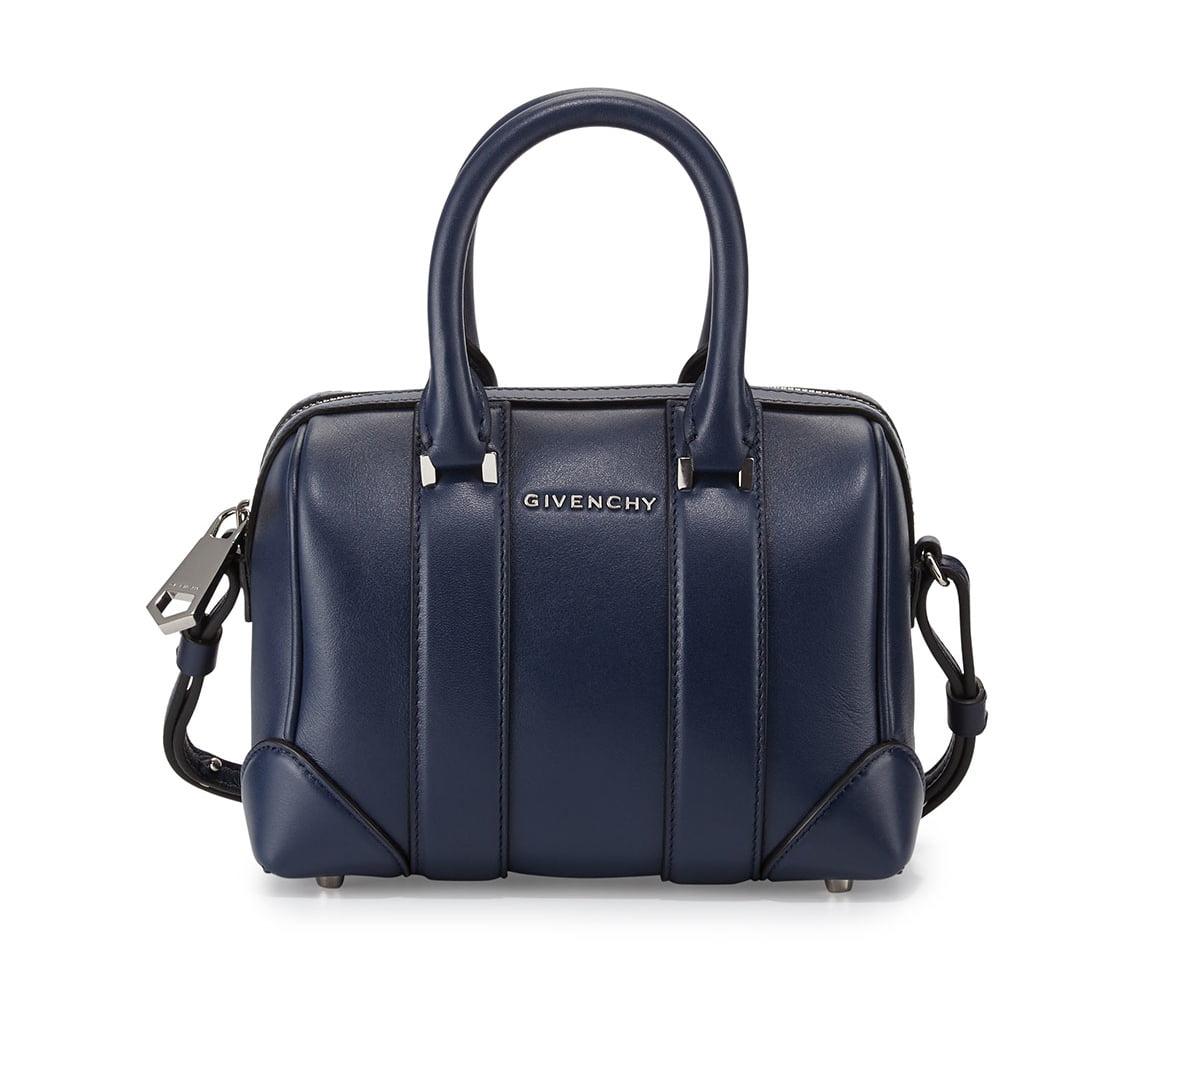 givenchy-dark-blue-lucrezia-micro-duffel-crossbody-bag-blue-product-1-936048947-normal